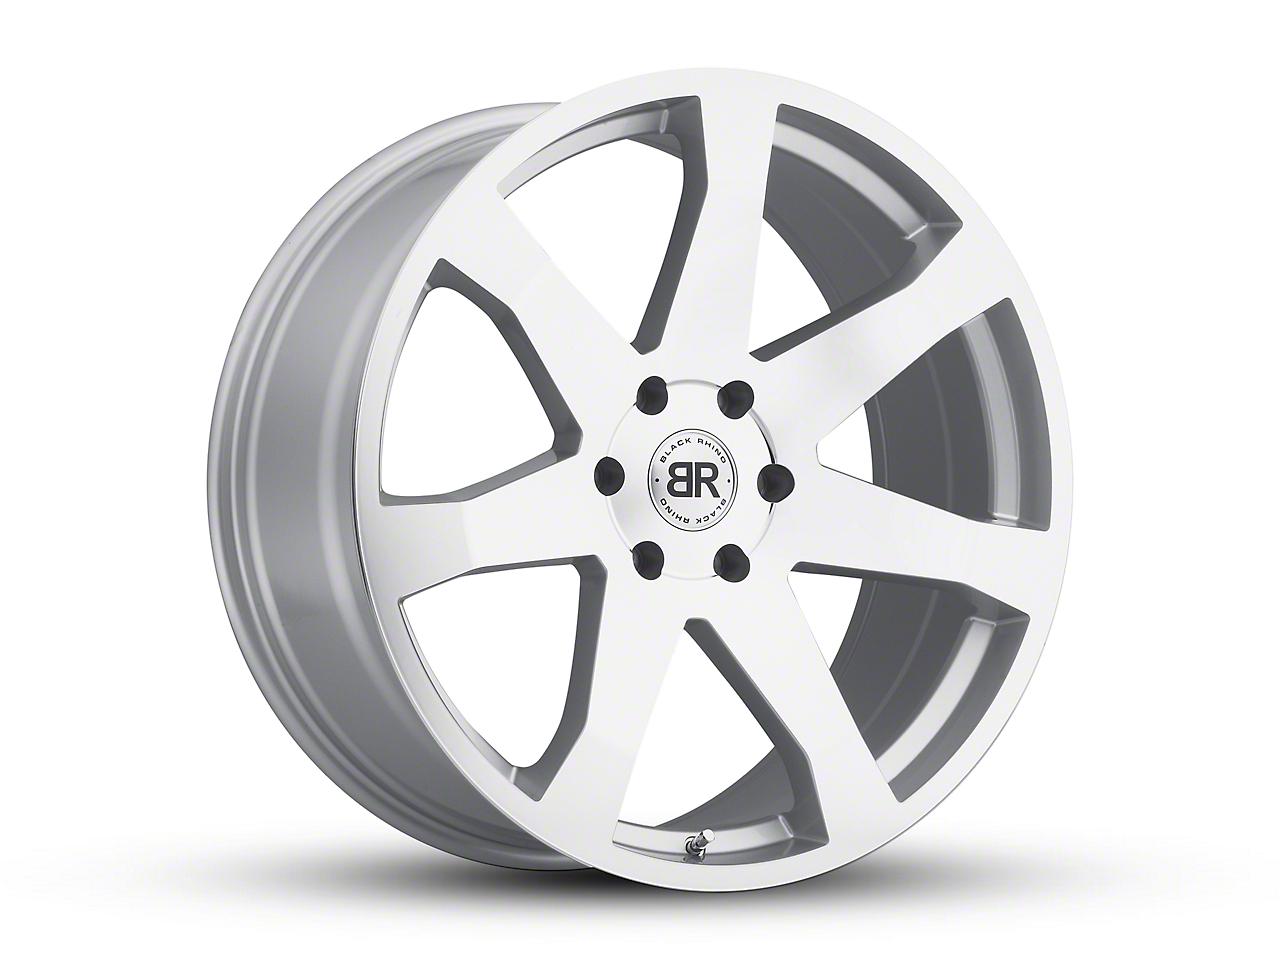 Black Rhino Mozambique Silver Wheels (07-18 Wrangler JK; 2018 Wrangler JL)